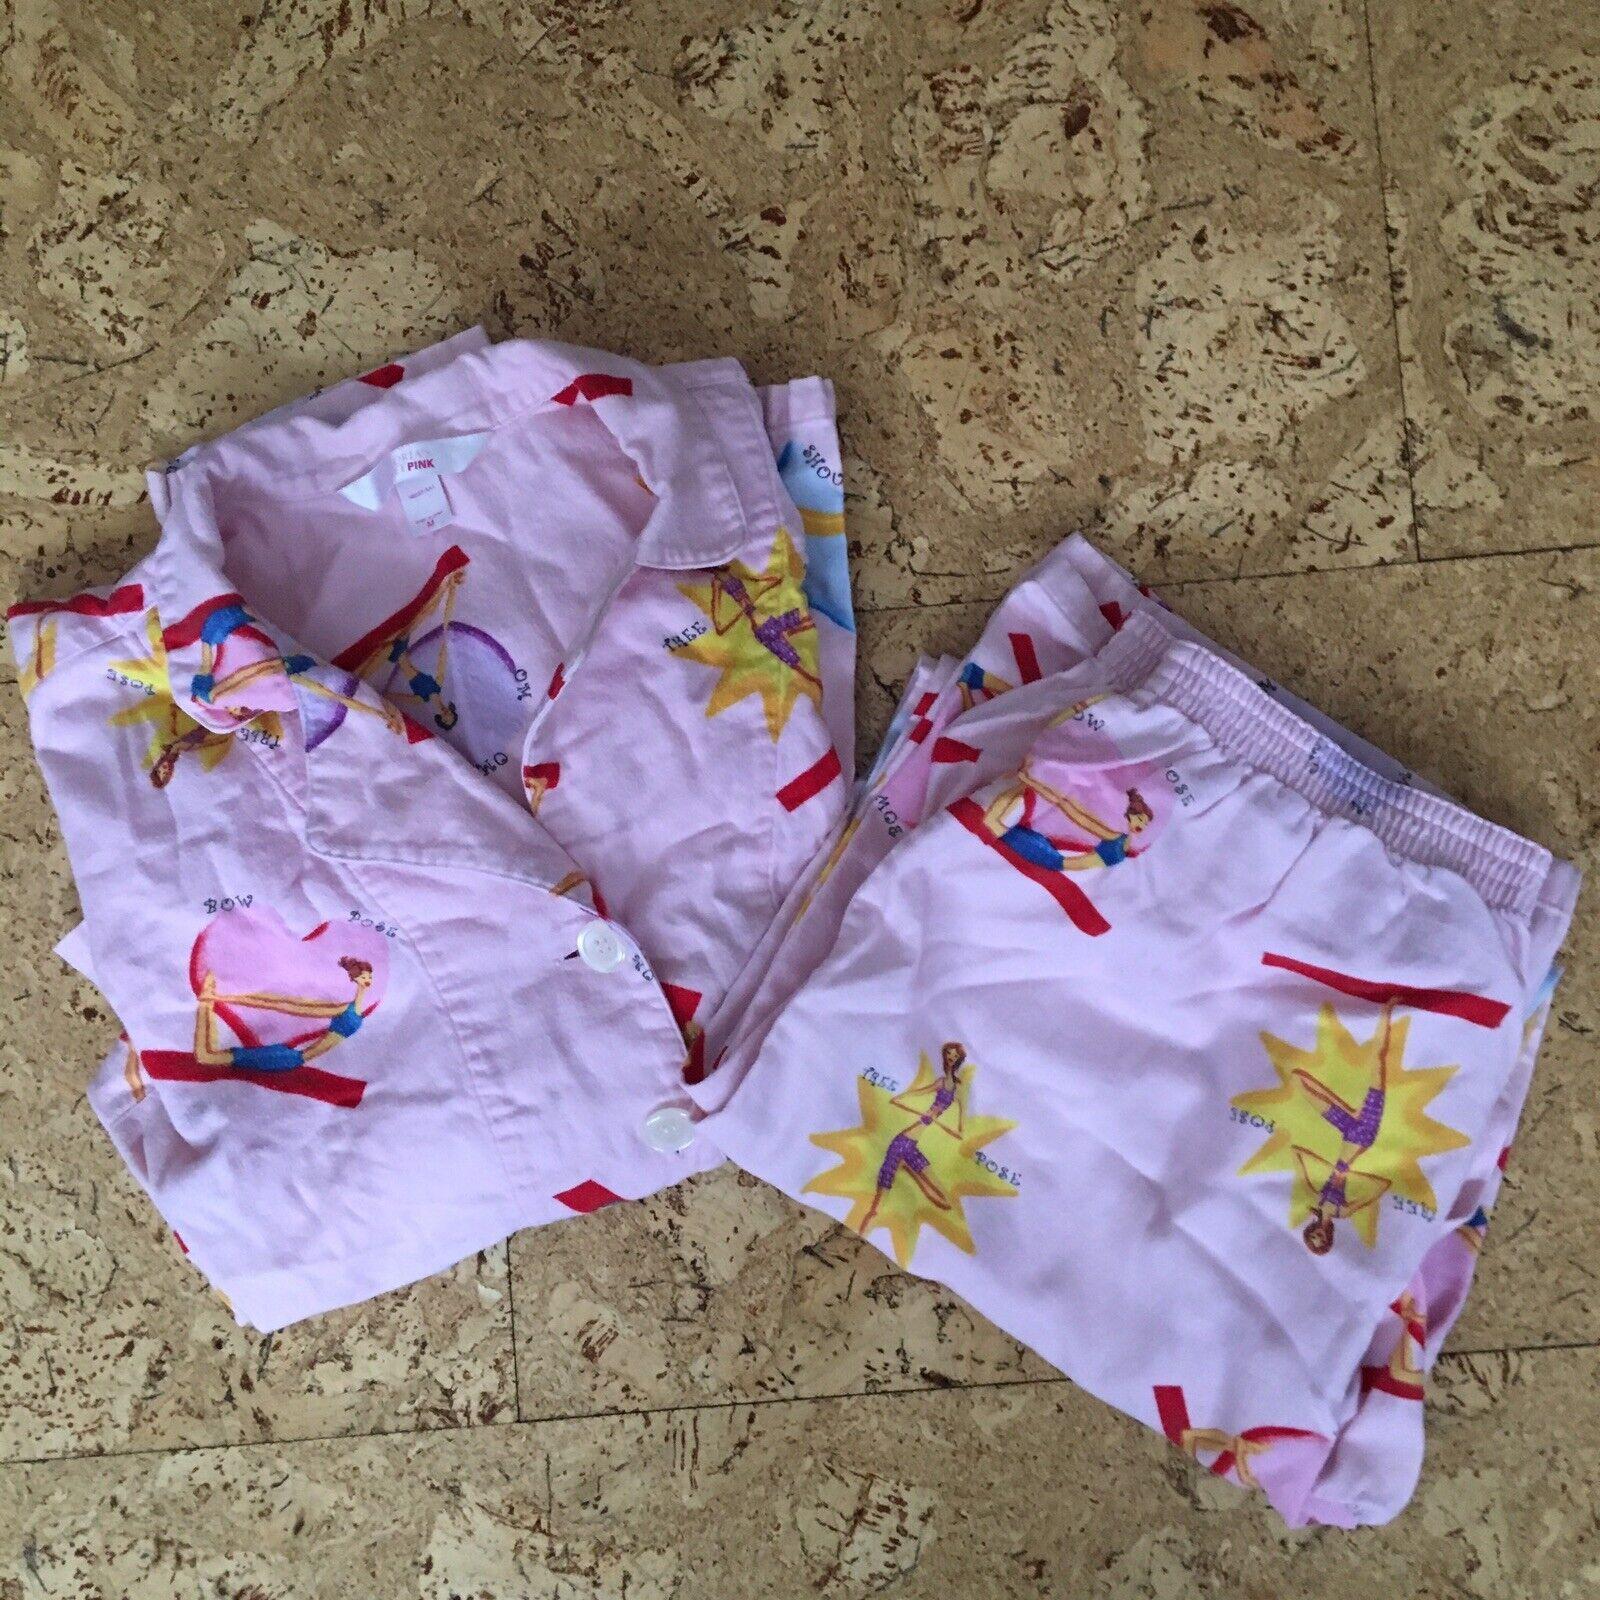 d28b5b249c Victoria s Secret PINK Flannel Yoga Print Pajama Set Lounge Pants Pants  Pants   Top Sz M GUC f03b91